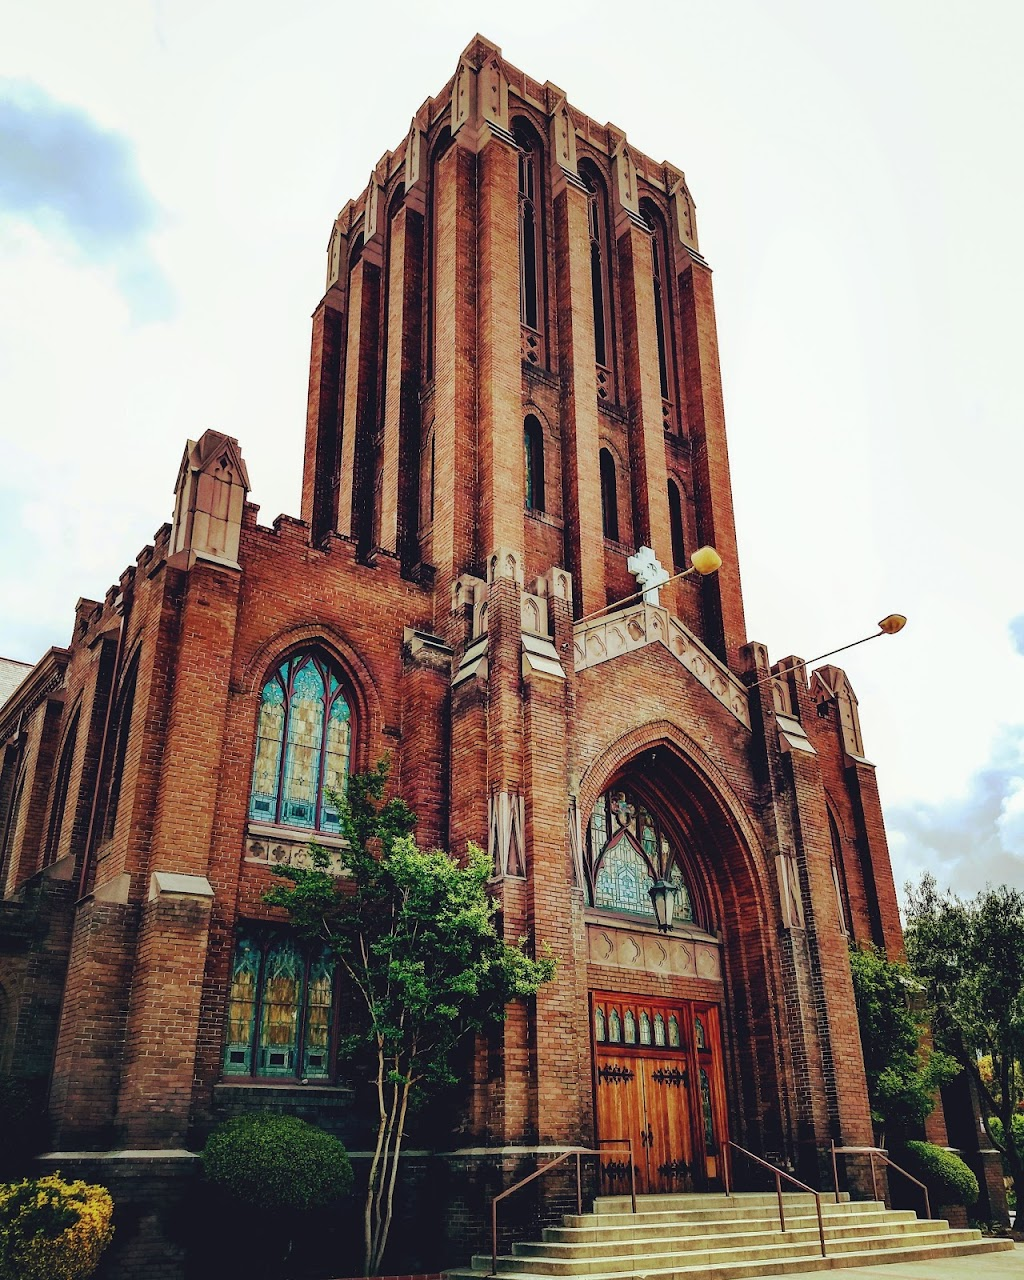 Pilgrim Congregational Church - church  | Photo 1 of 10 | Address: 600 N Garey Ave, Pomona, CA 91767, USA | Phone: (909) 622-1373